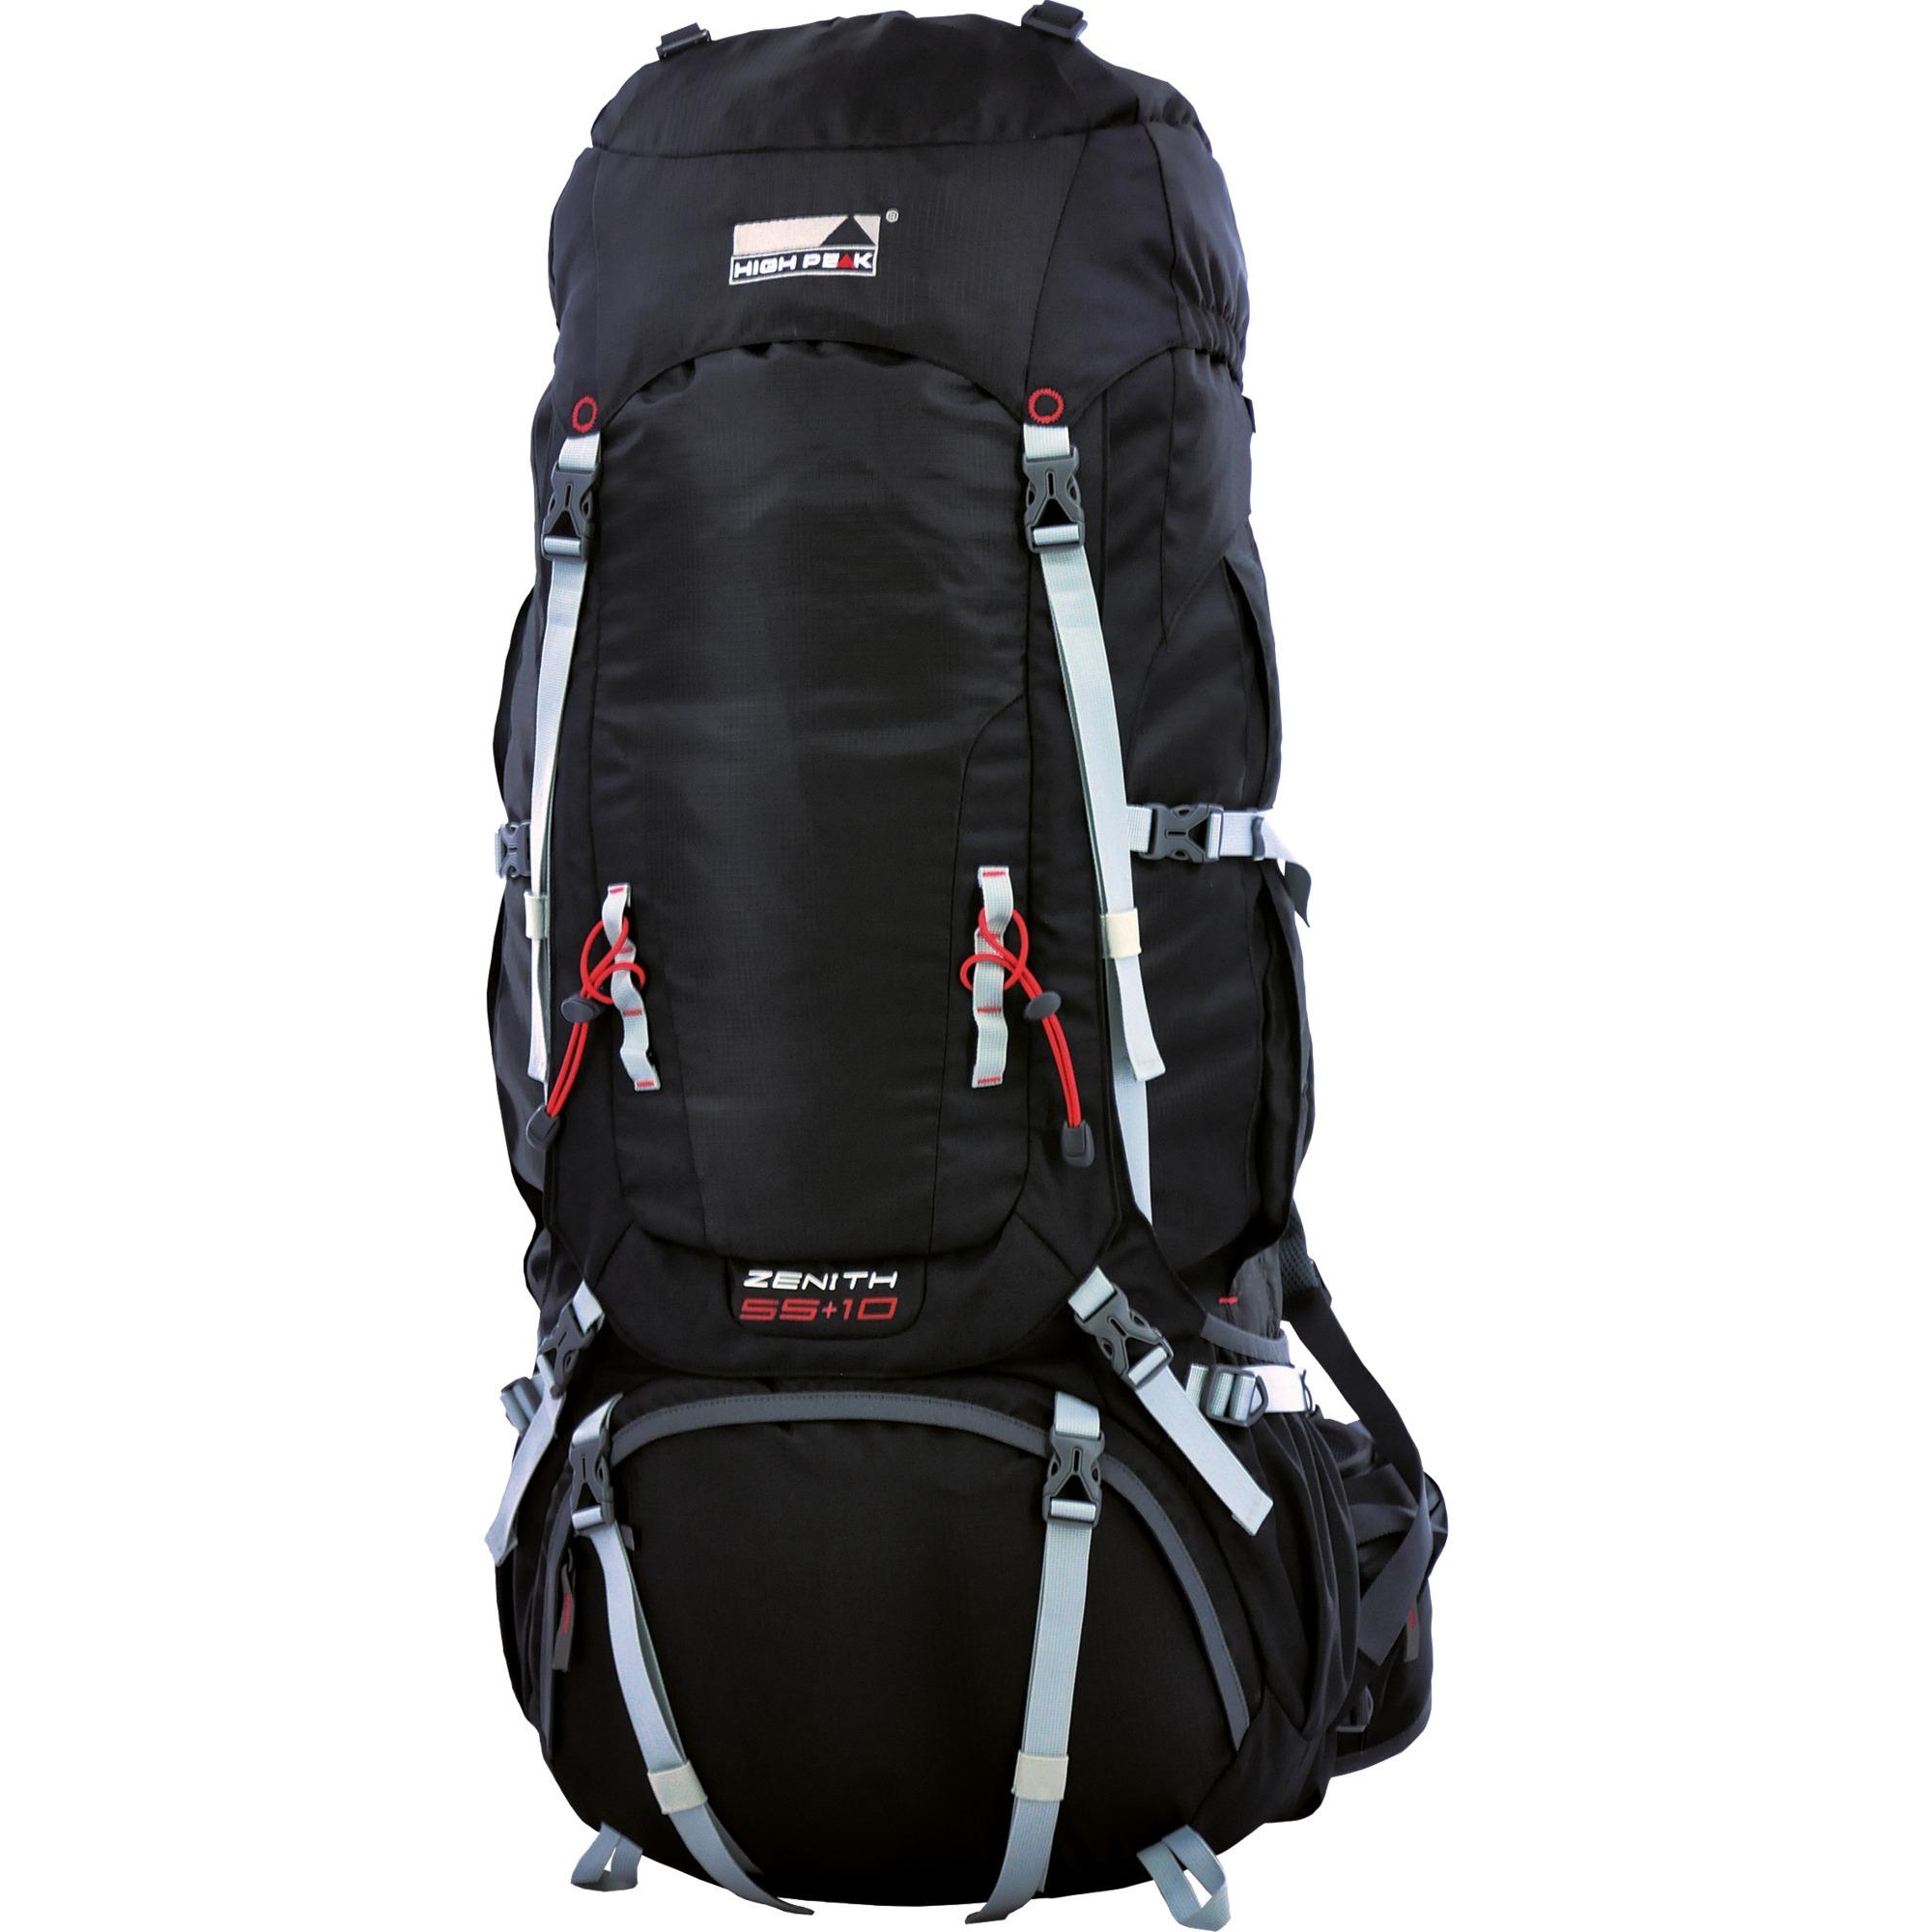 zenith-5510-mand-65l-sort-rejse-rygsak